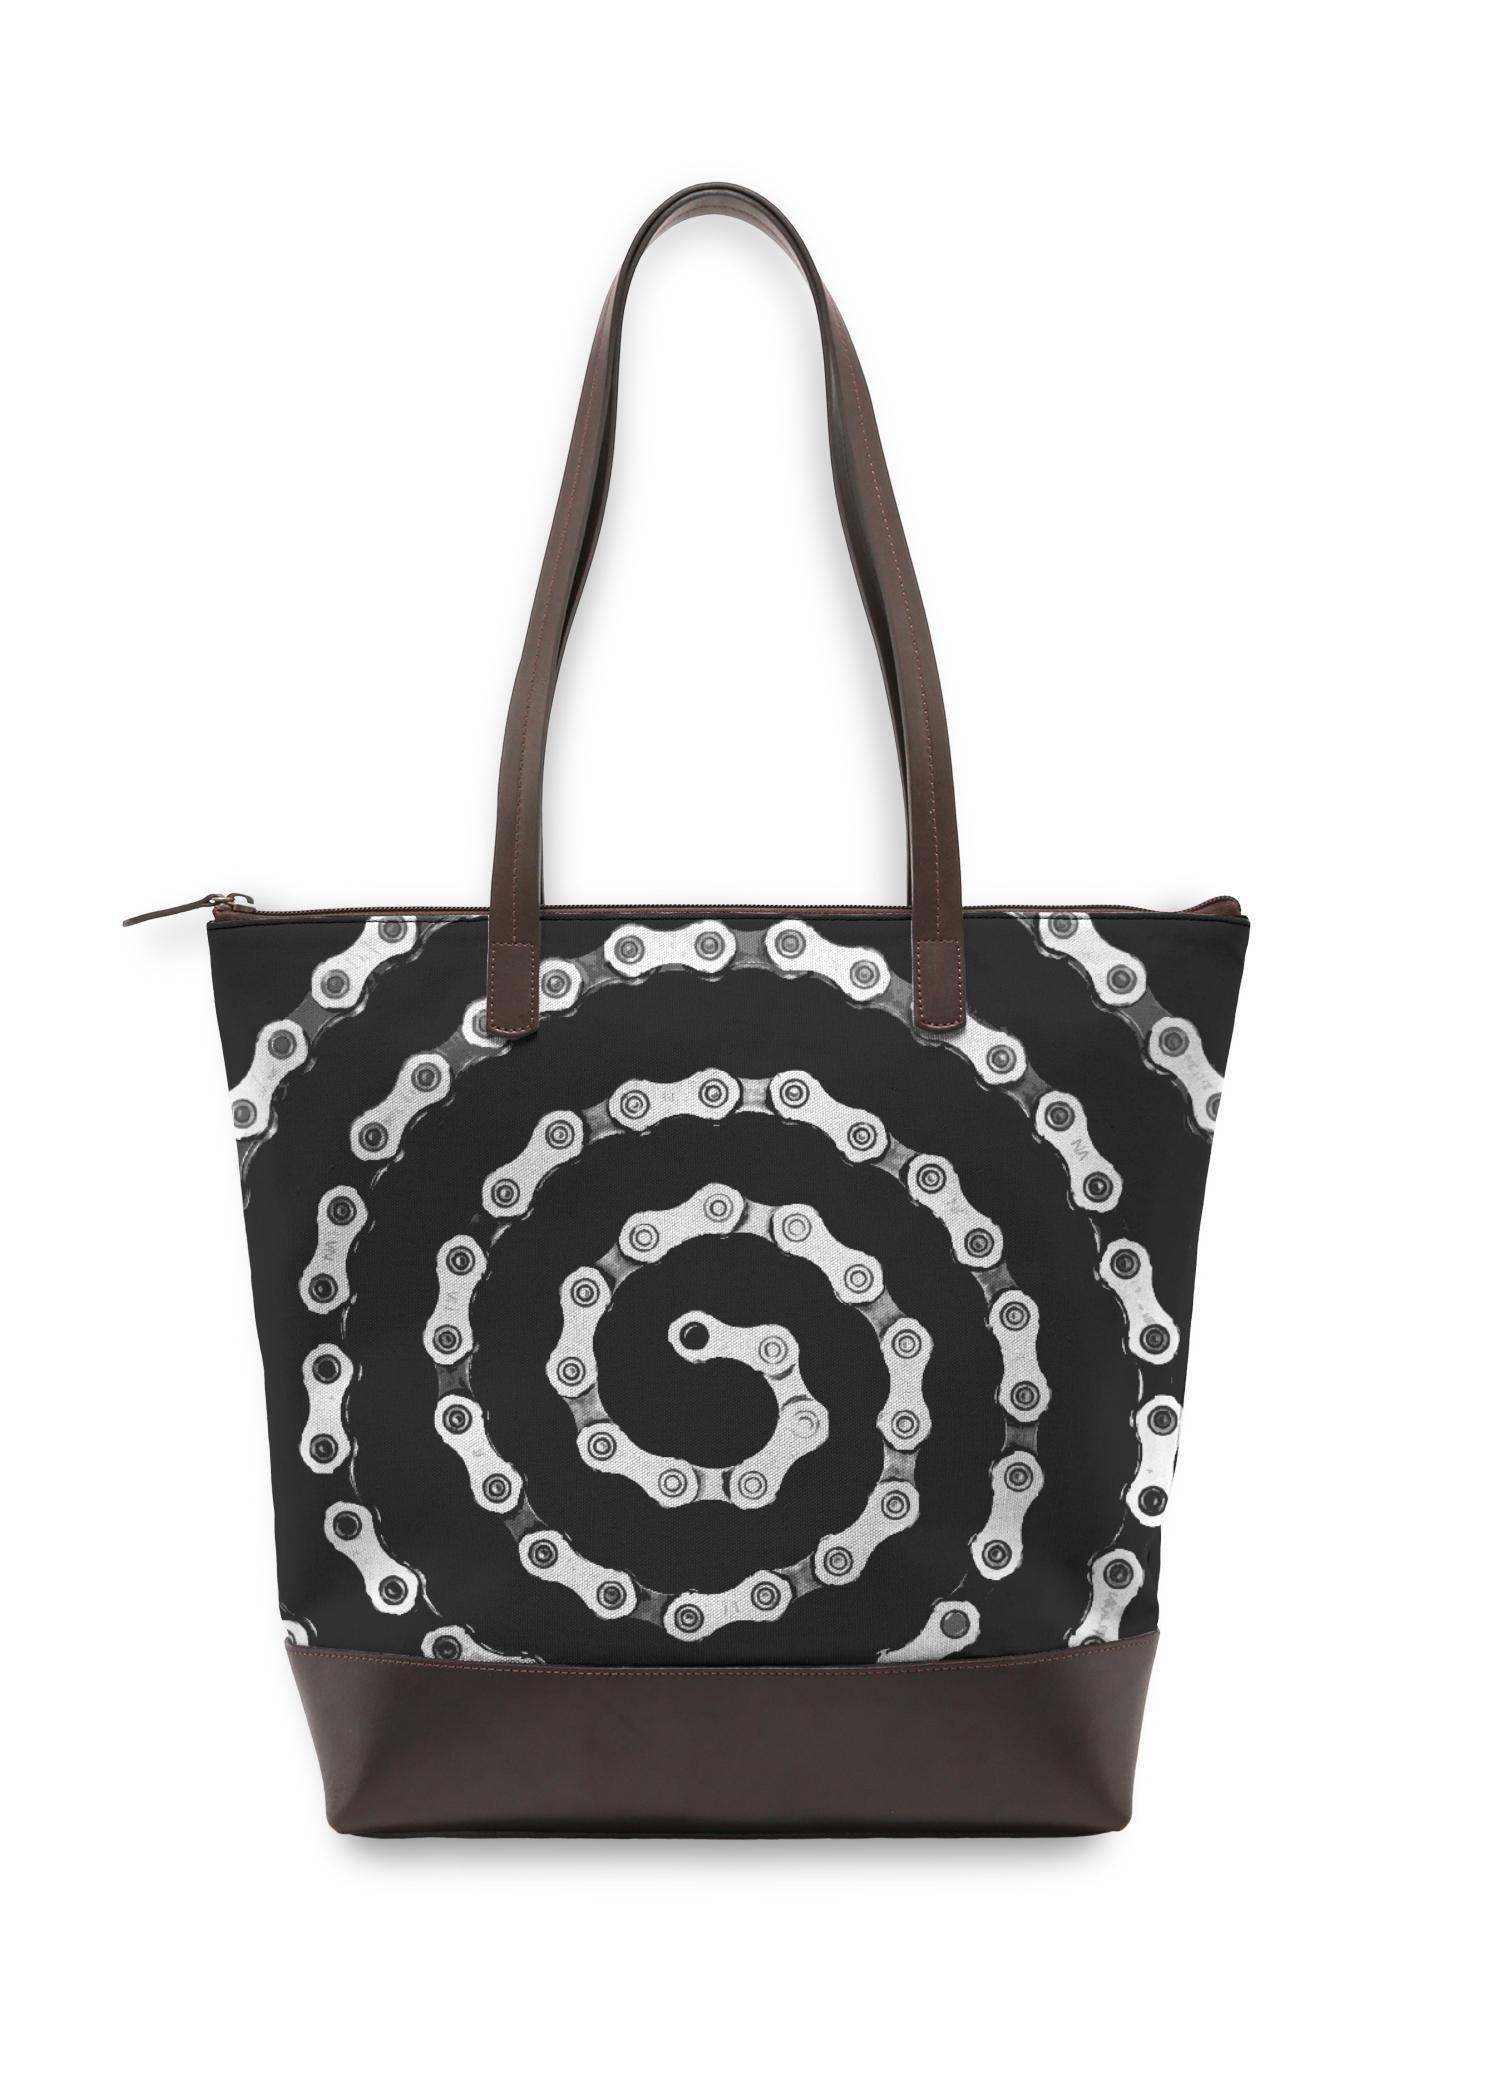 VIDA Statement Bag - Bike Chain Spiral by VIDA Original Artist  - Size: One Size